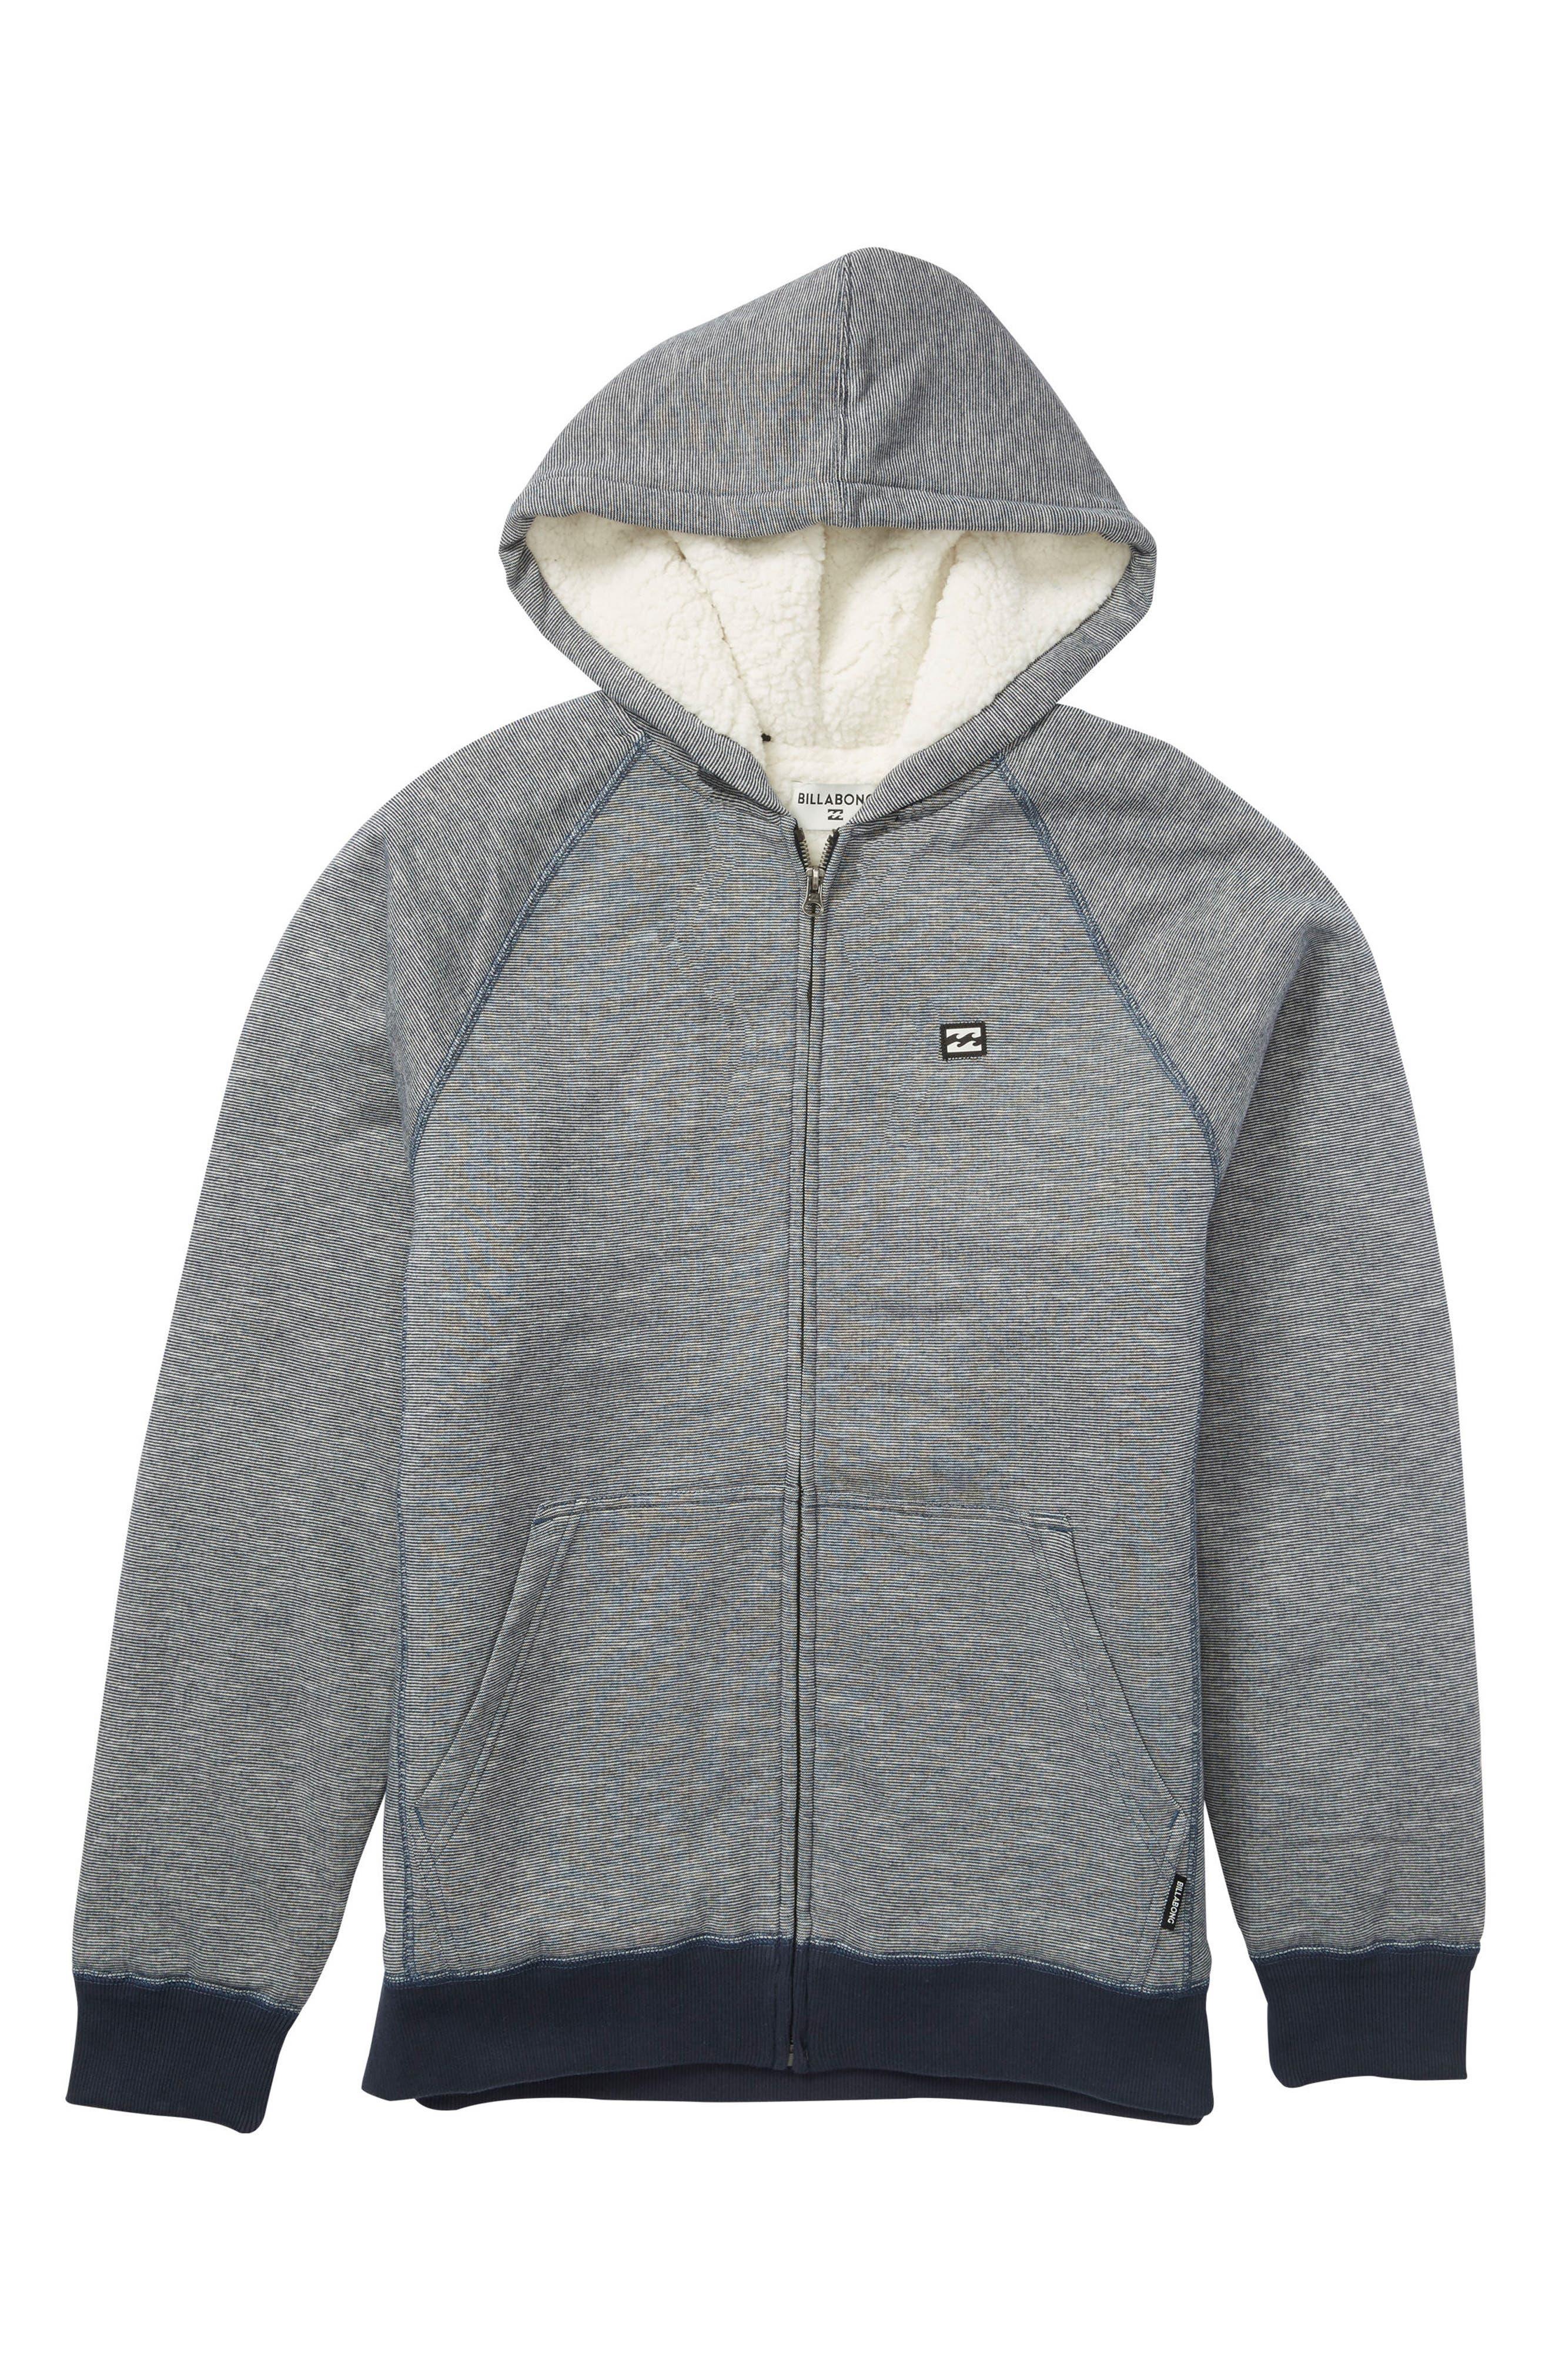 Alternate Image 1 Selected - Billabong Balance Fleece Lined Zip Hoodie (Toddler Boys & Little Boys)